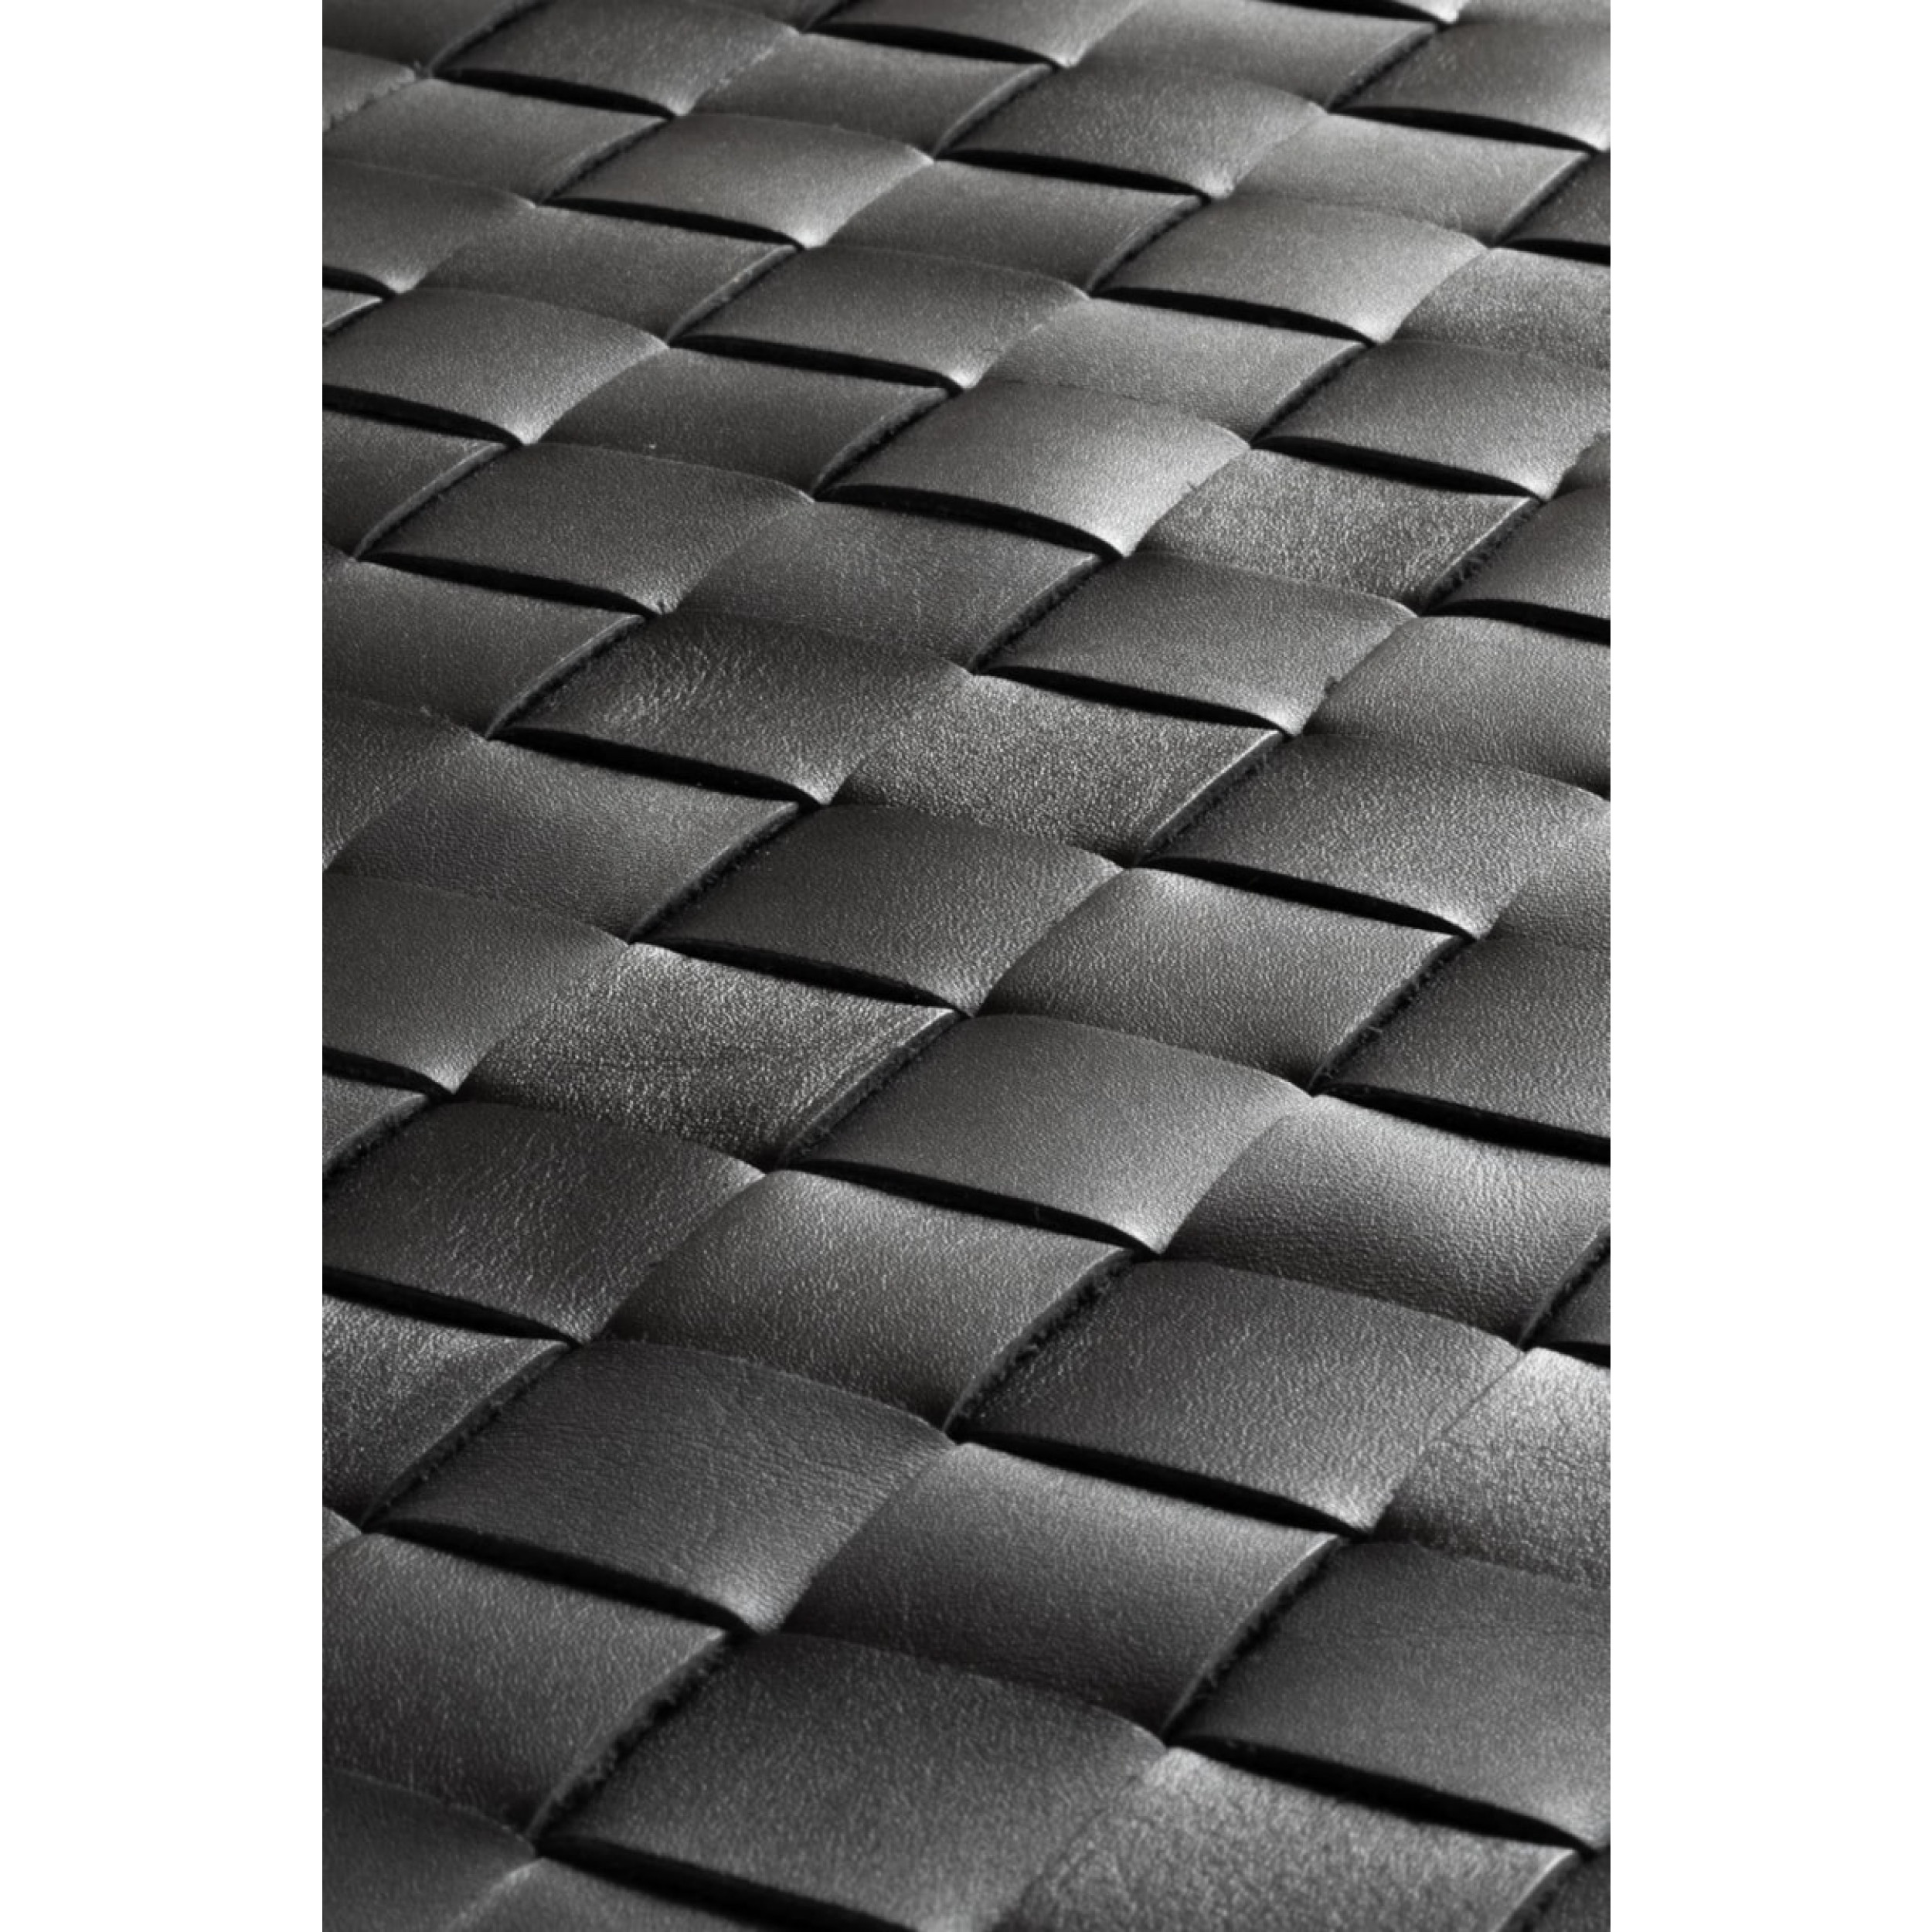 Kalbsleder Teppich Tuscany | Matt-schwarz